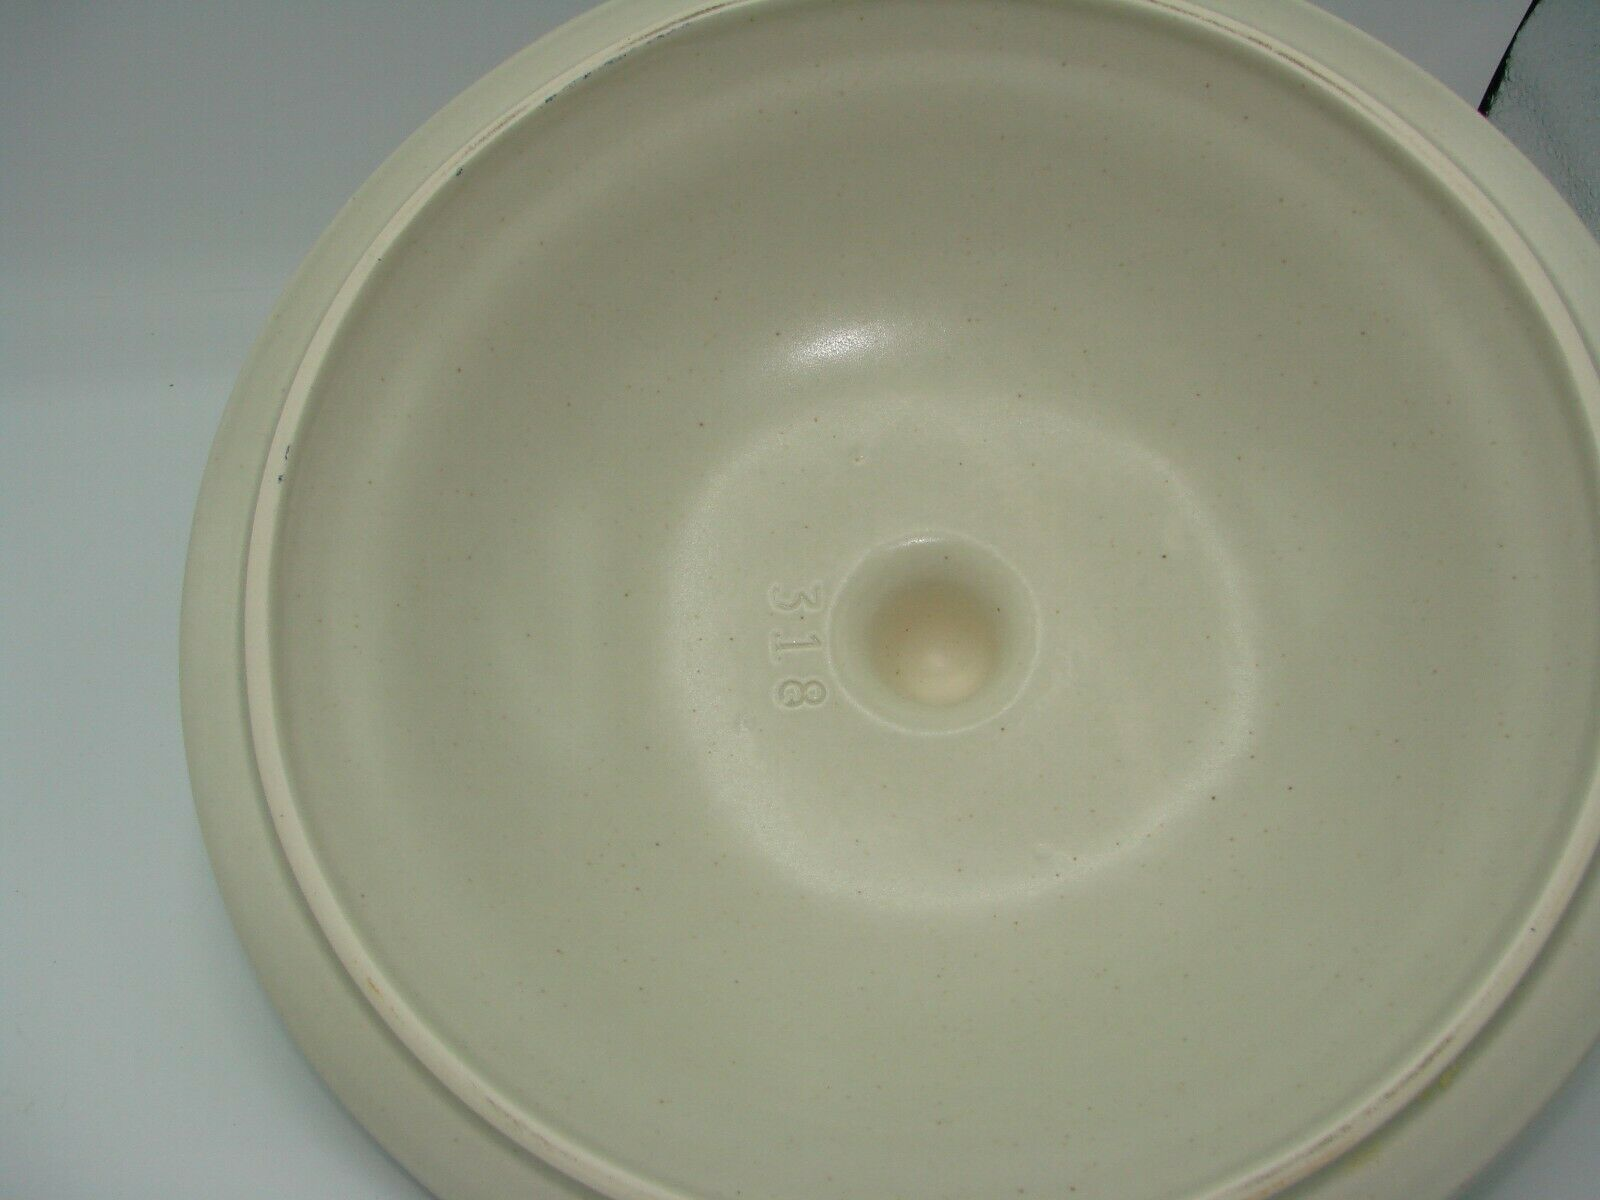 Pristine Pfaltzgraff Heirloom Covered Casserole Dish 8.75 2 Quart White Flowers image 6